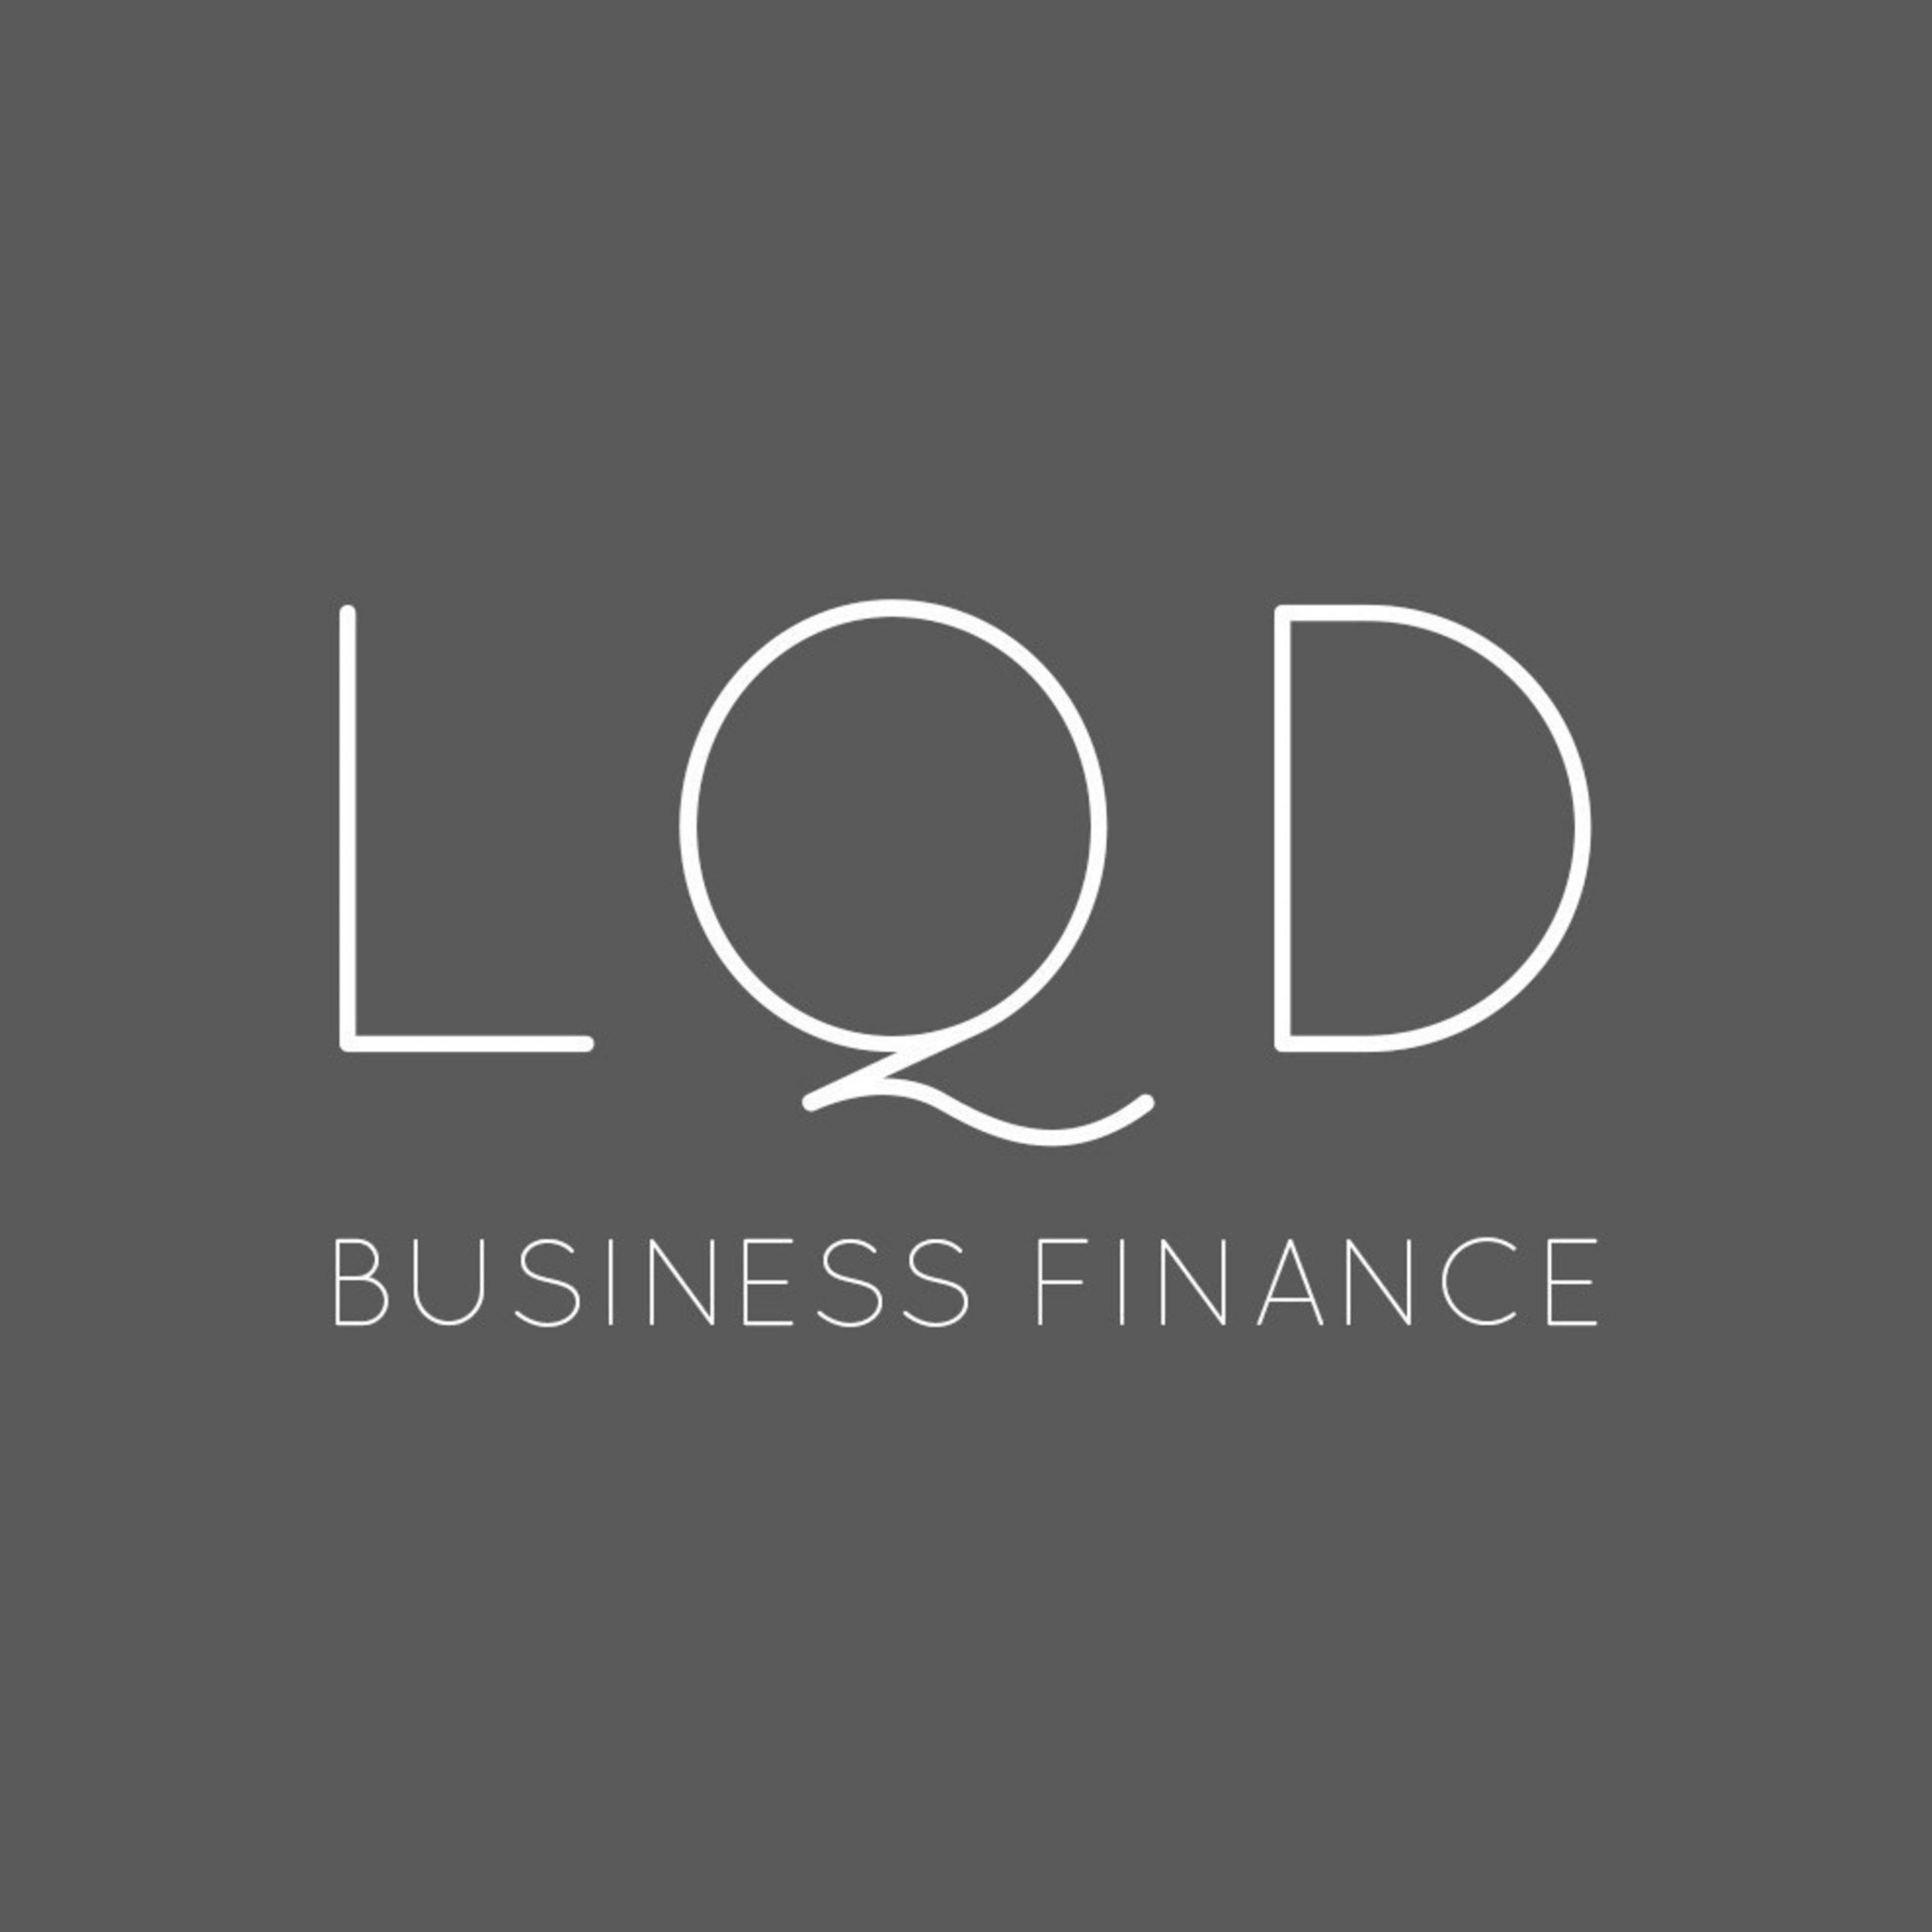 Lqd Business Finance Business Loans Commercial Lending